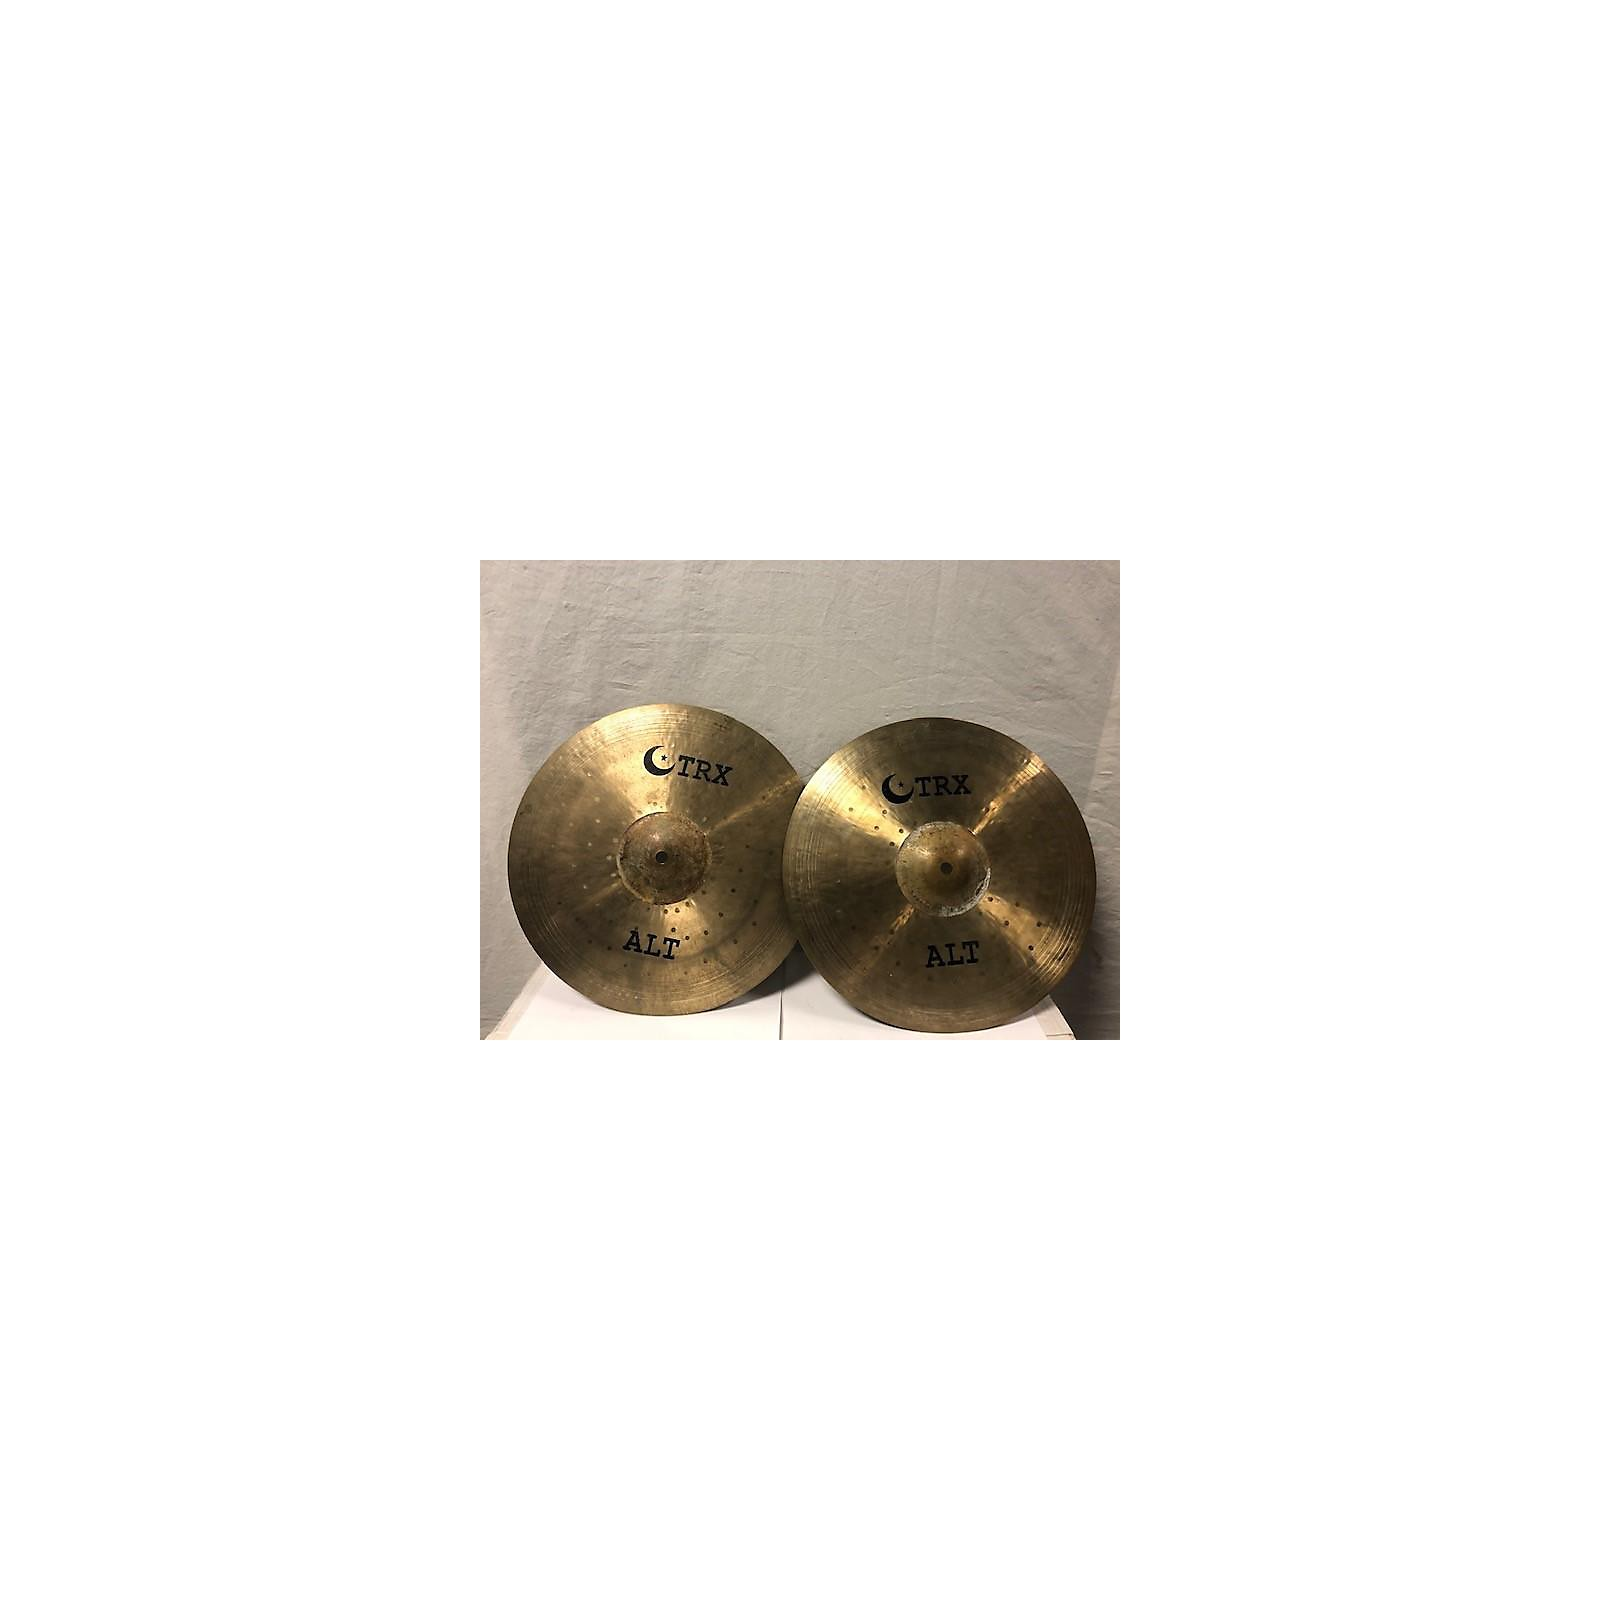 TRX 14in ALT Hi-hat Pair Cymbal